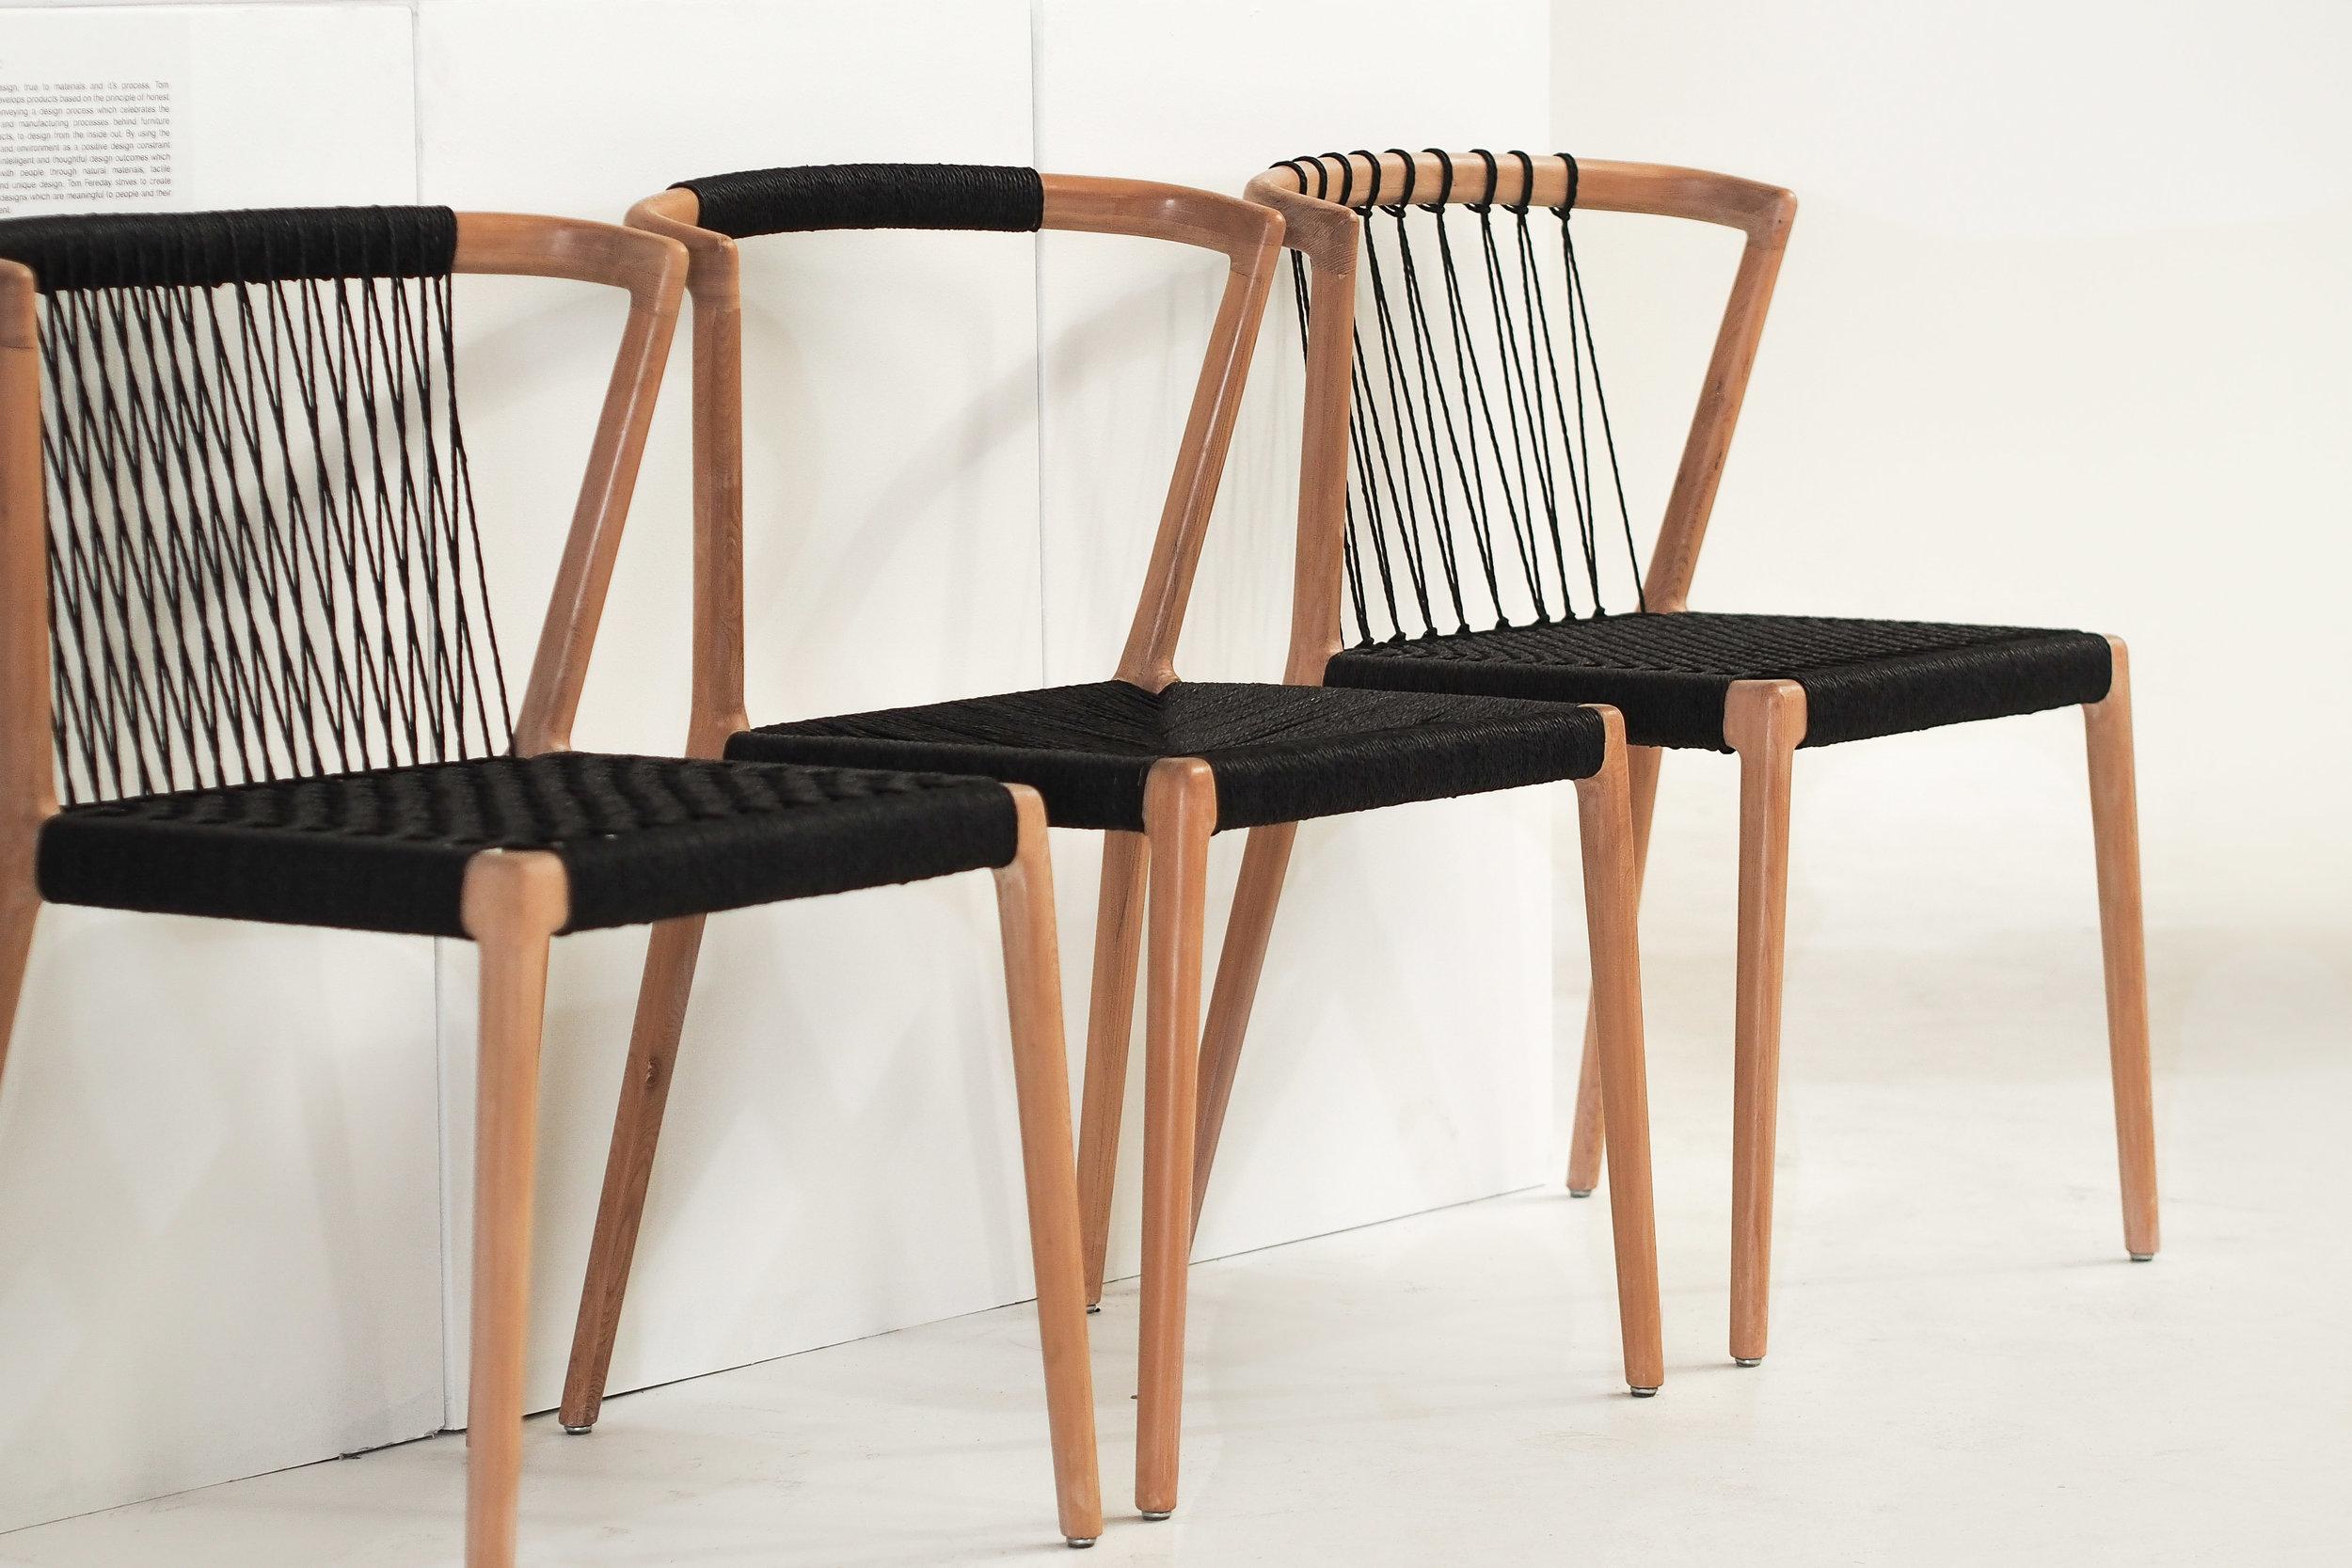 'Pieman Chair' by Tom Fereday